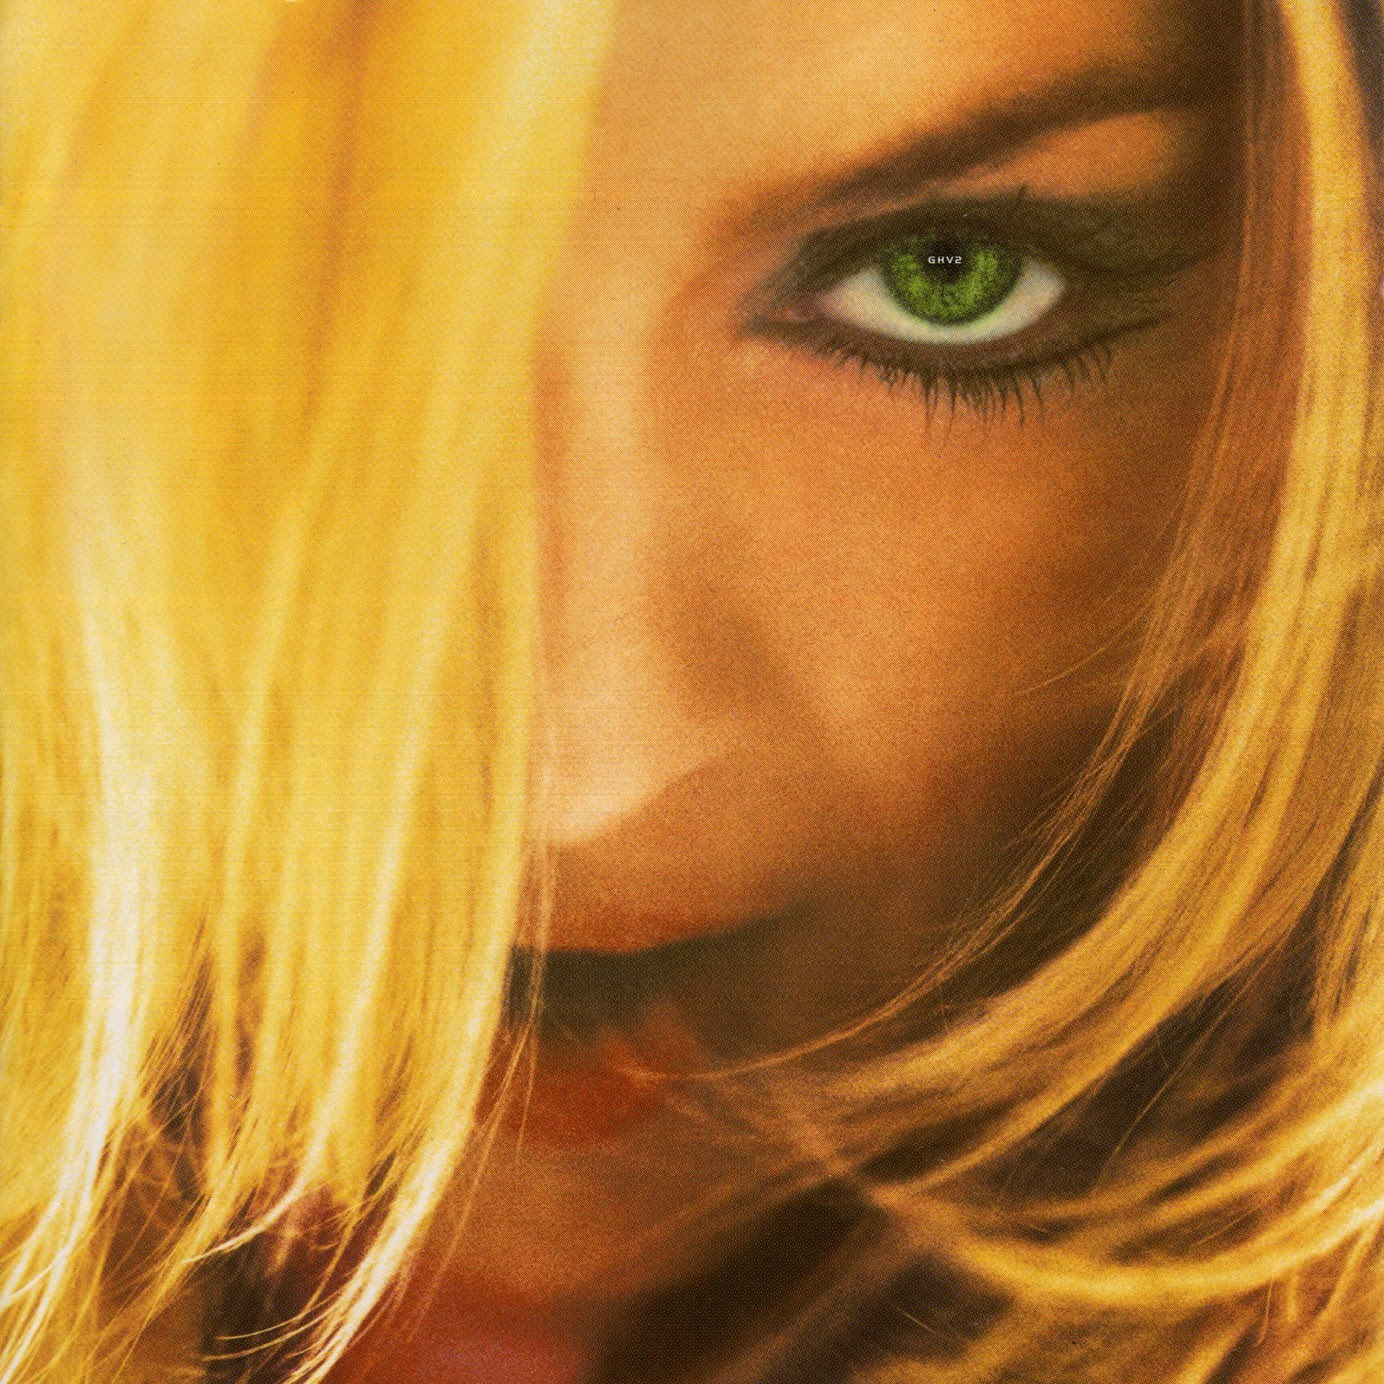 http://4.bp.blogspot.com/_f2iAGRf_Ioo/TIZdZ6V8fkI/AAAAAAAABTs/_dtTTcaMZNA/s1600/Madonna+-+GHV2+%5BFront%5D.jpg